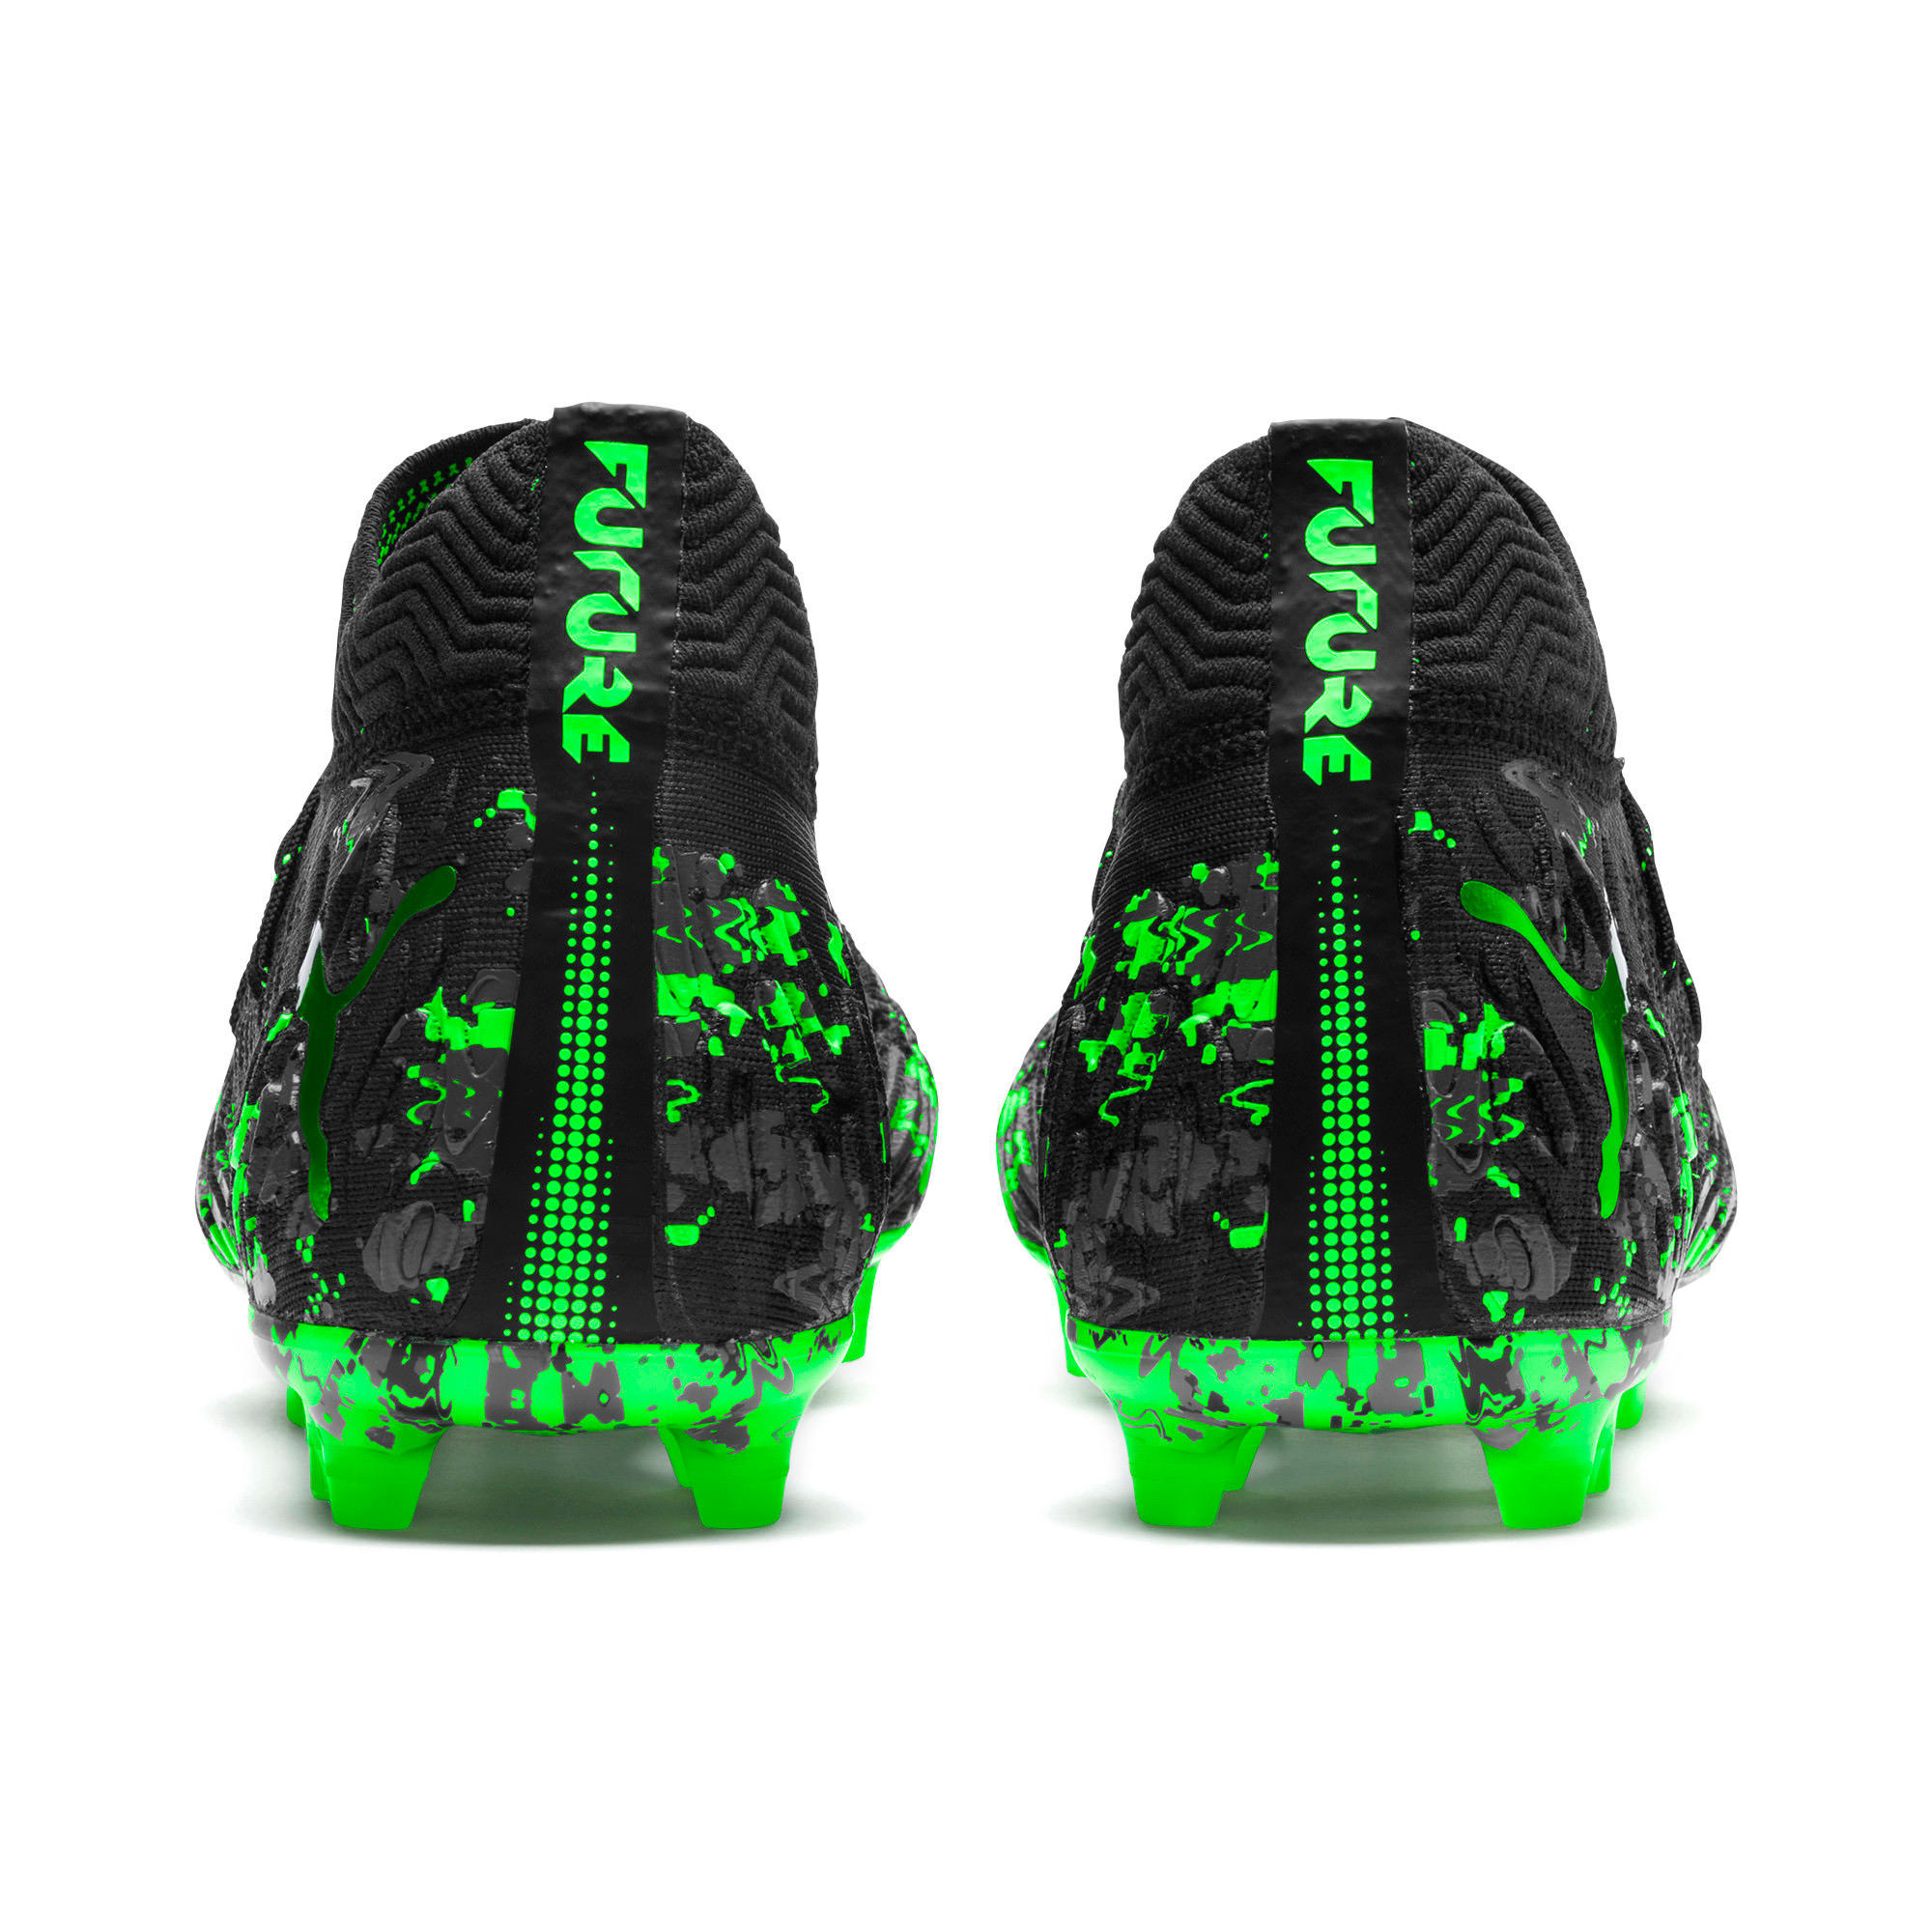 Thumbnail 5 of FUTURE 19.1 NETFIT FG/AG Men's Soccer Cleats, Black-Gray-Green Gecko, medium